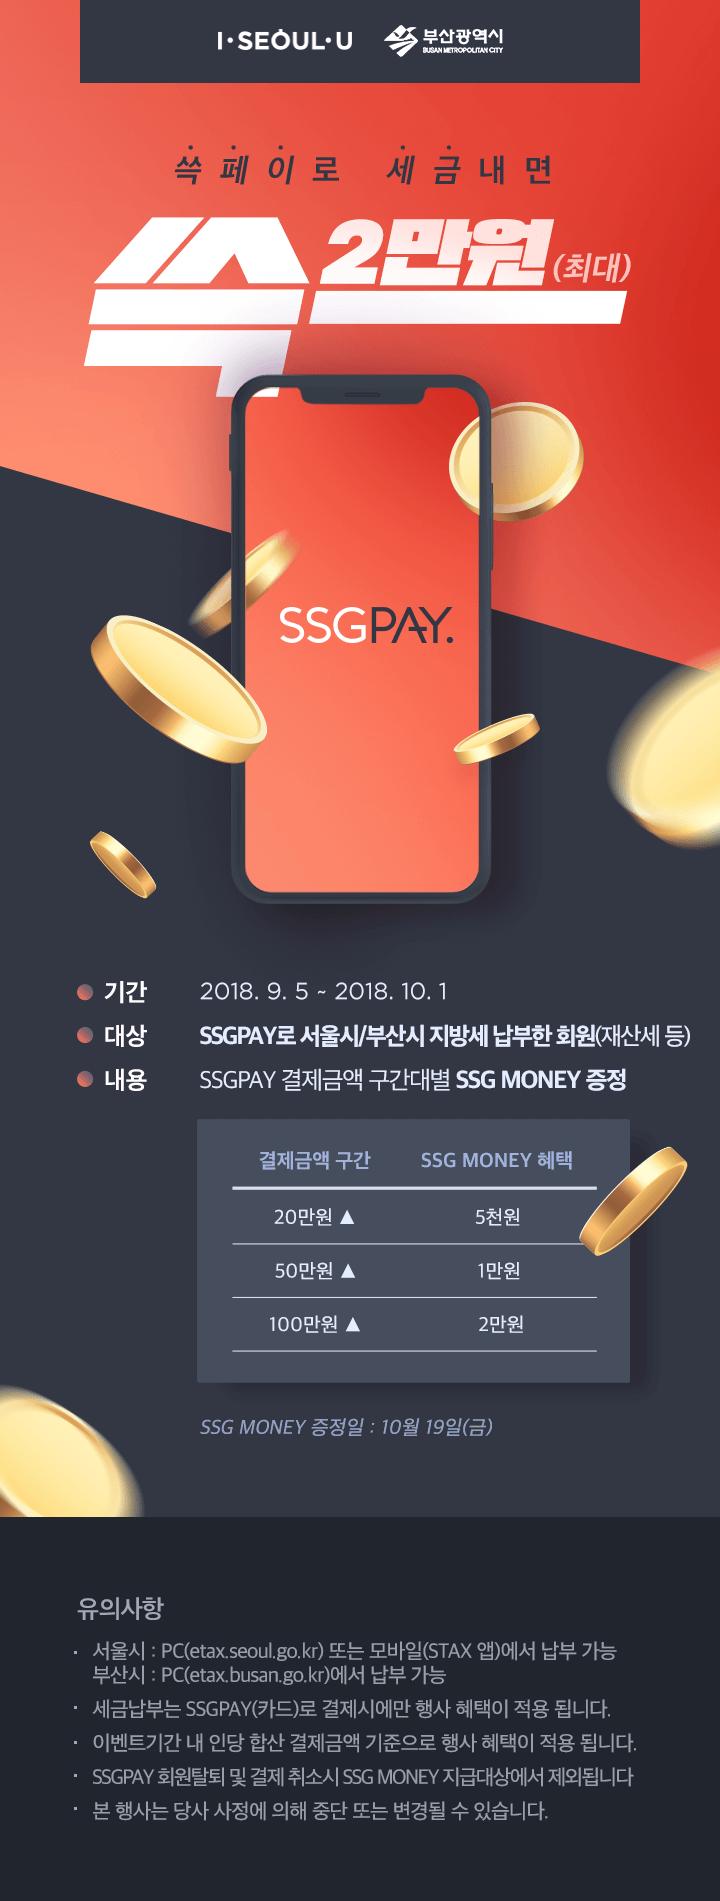 ssgpay_서울부산지방세납부_720.png